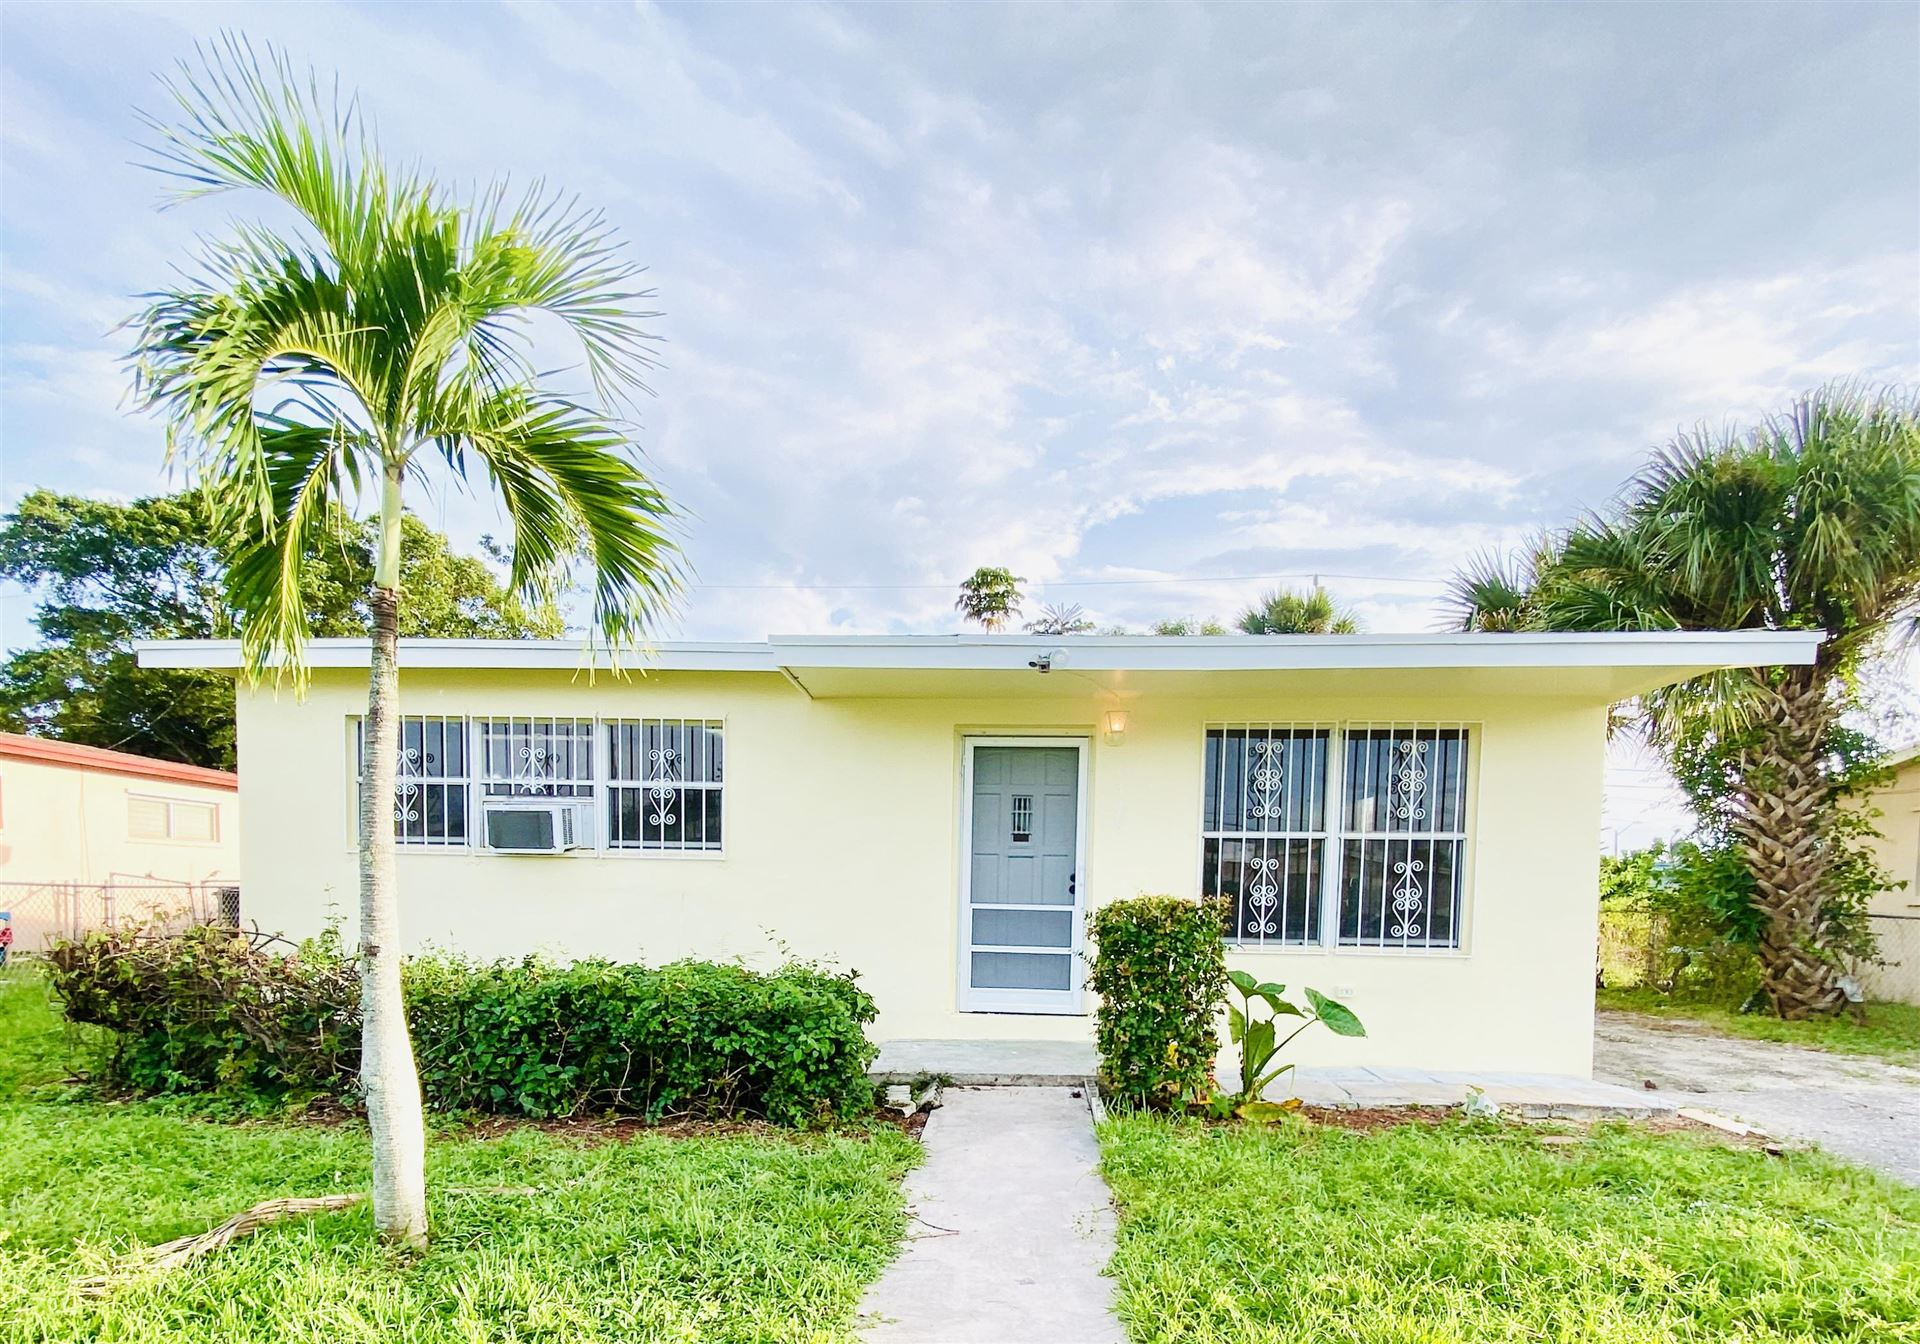 1348 9th Street, West Palm Beach, FL 33401 - MLS#: RX-10666630